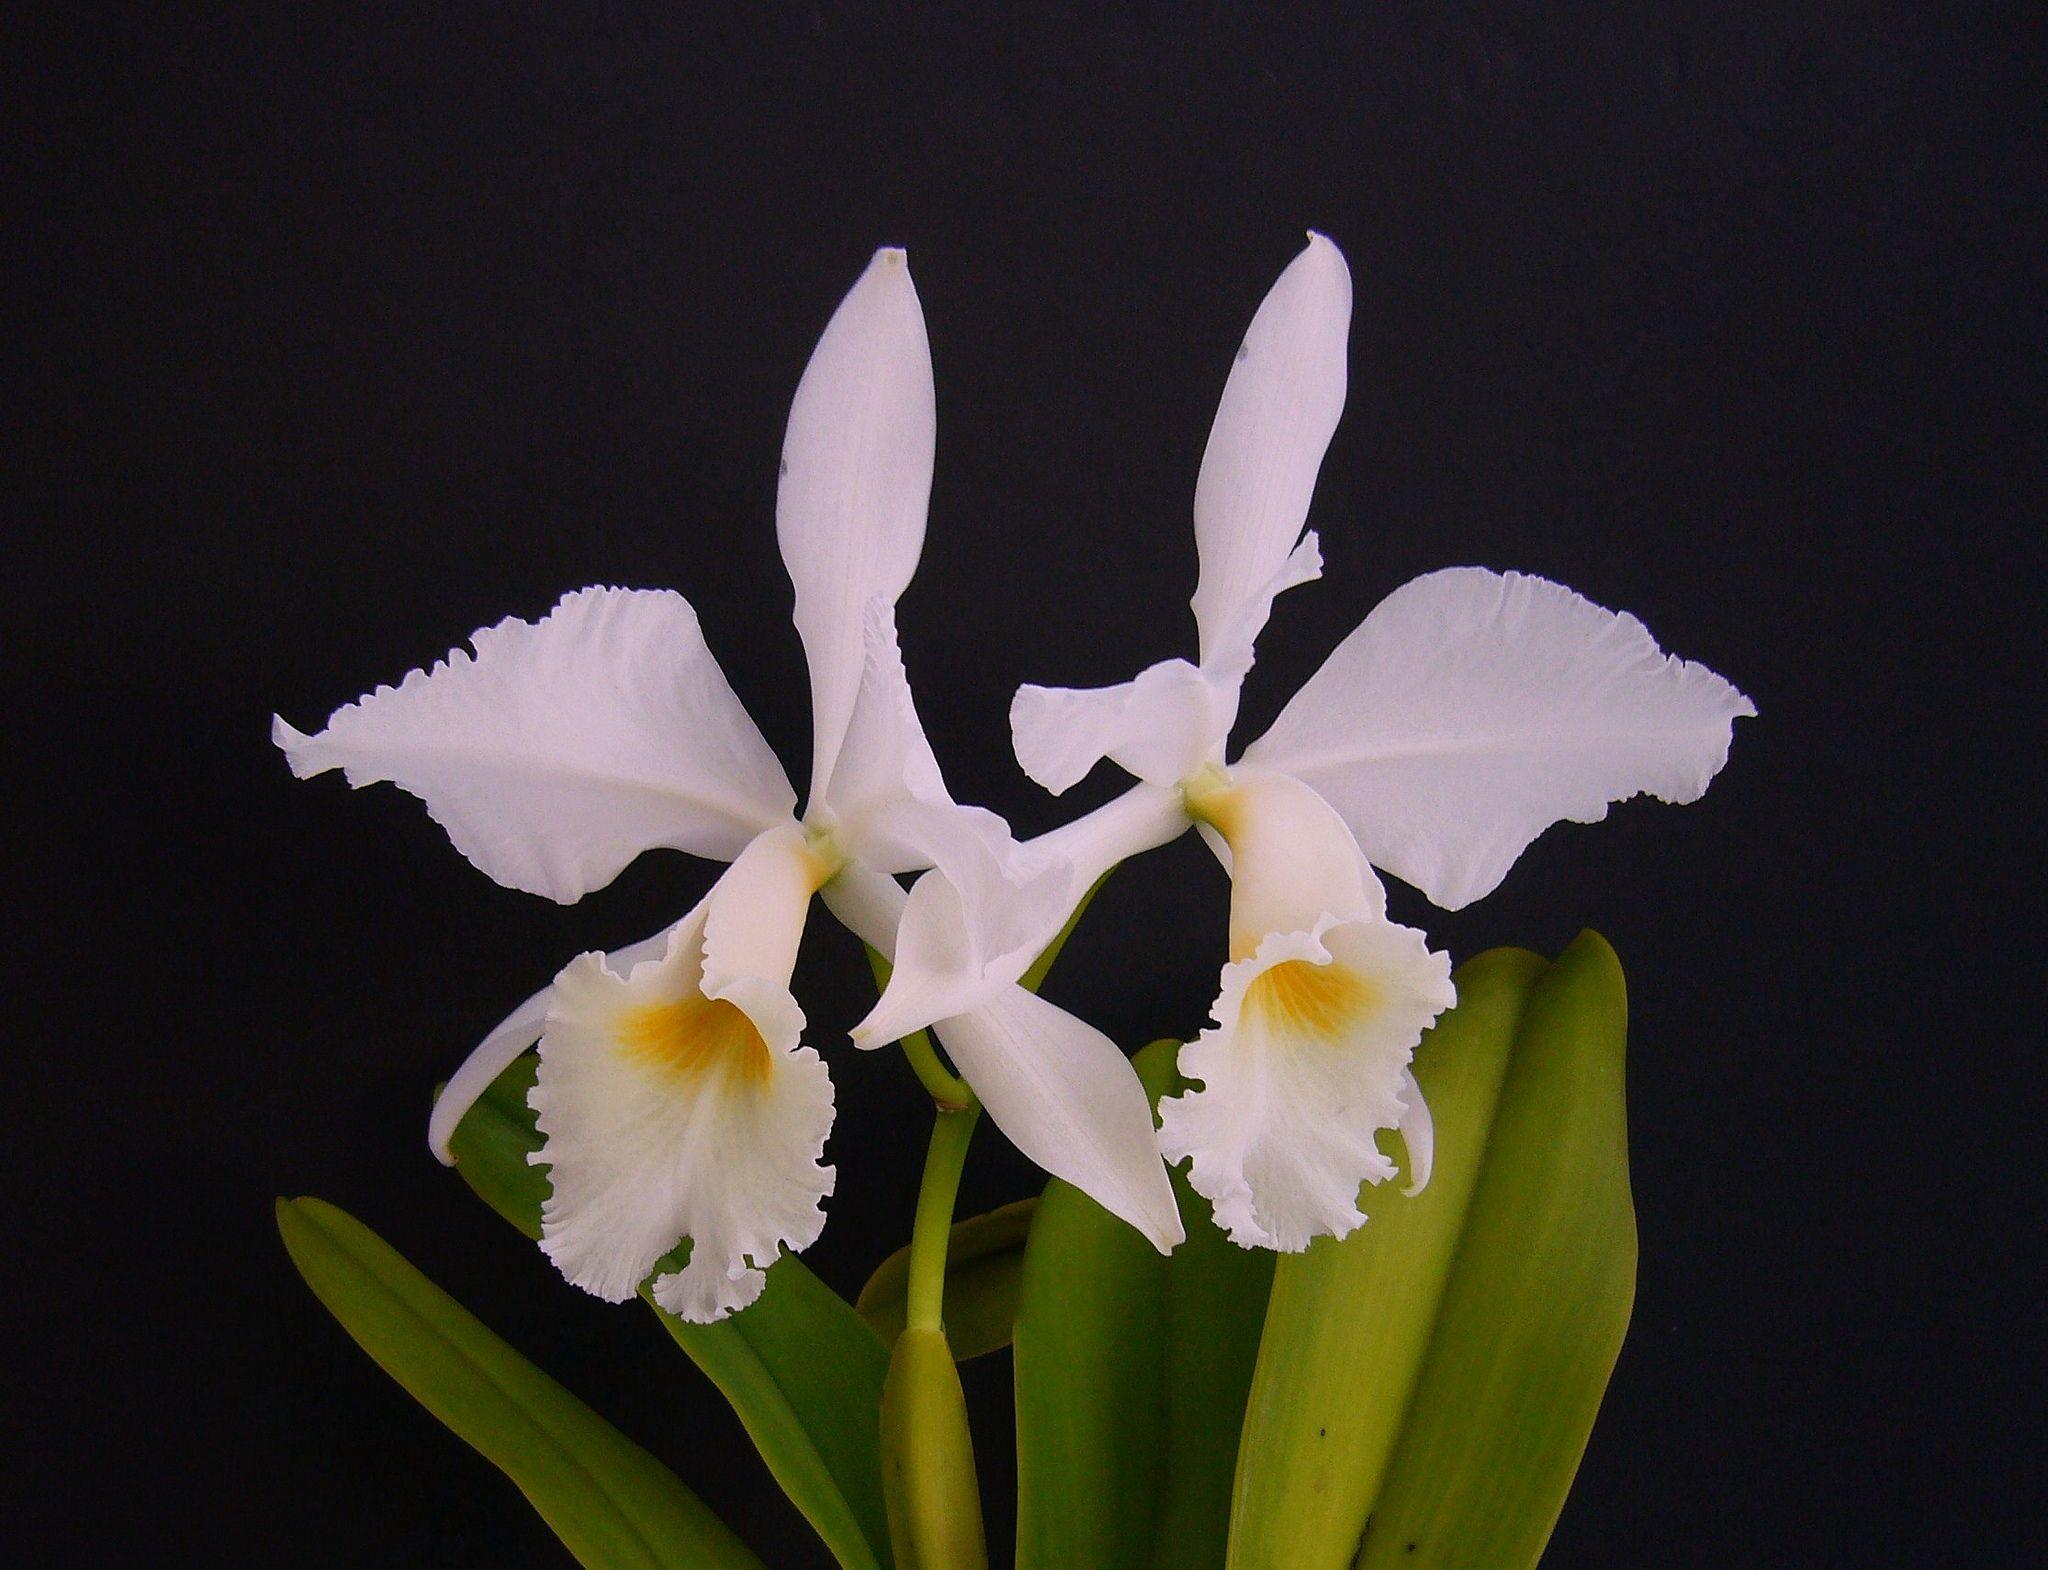 Cattleya labiata var  alba 'Angerer' | Orchid Flowers # 1